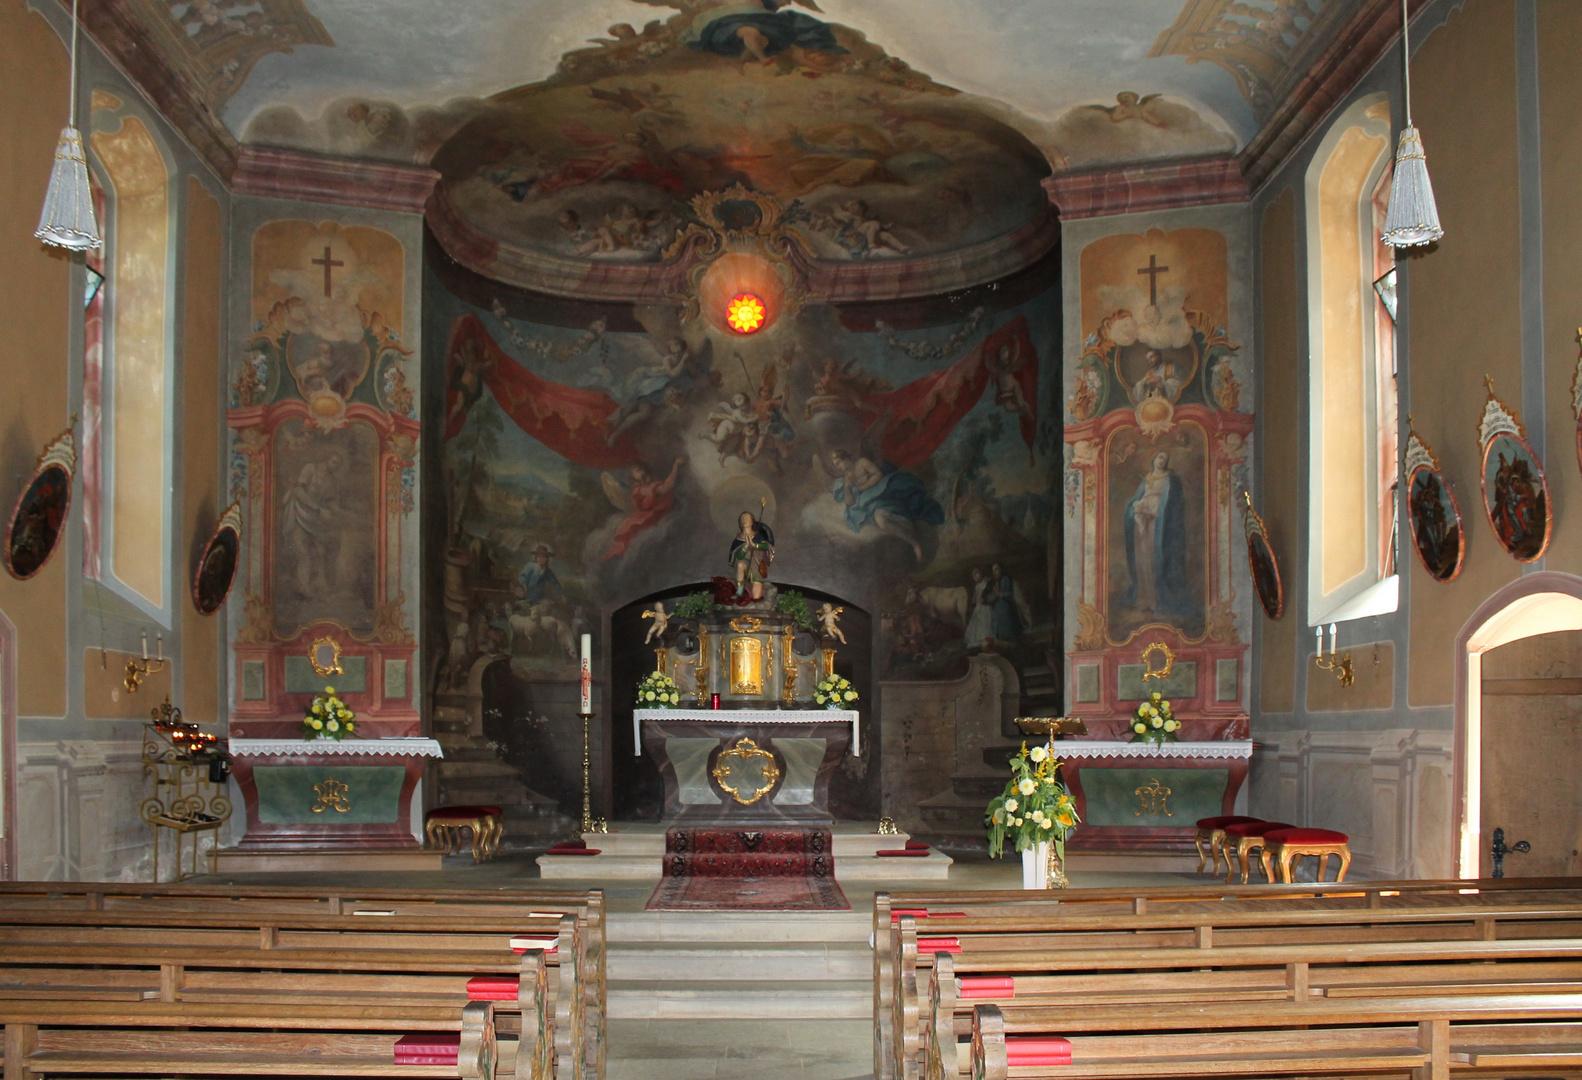 St. Wendelin / Bottenau